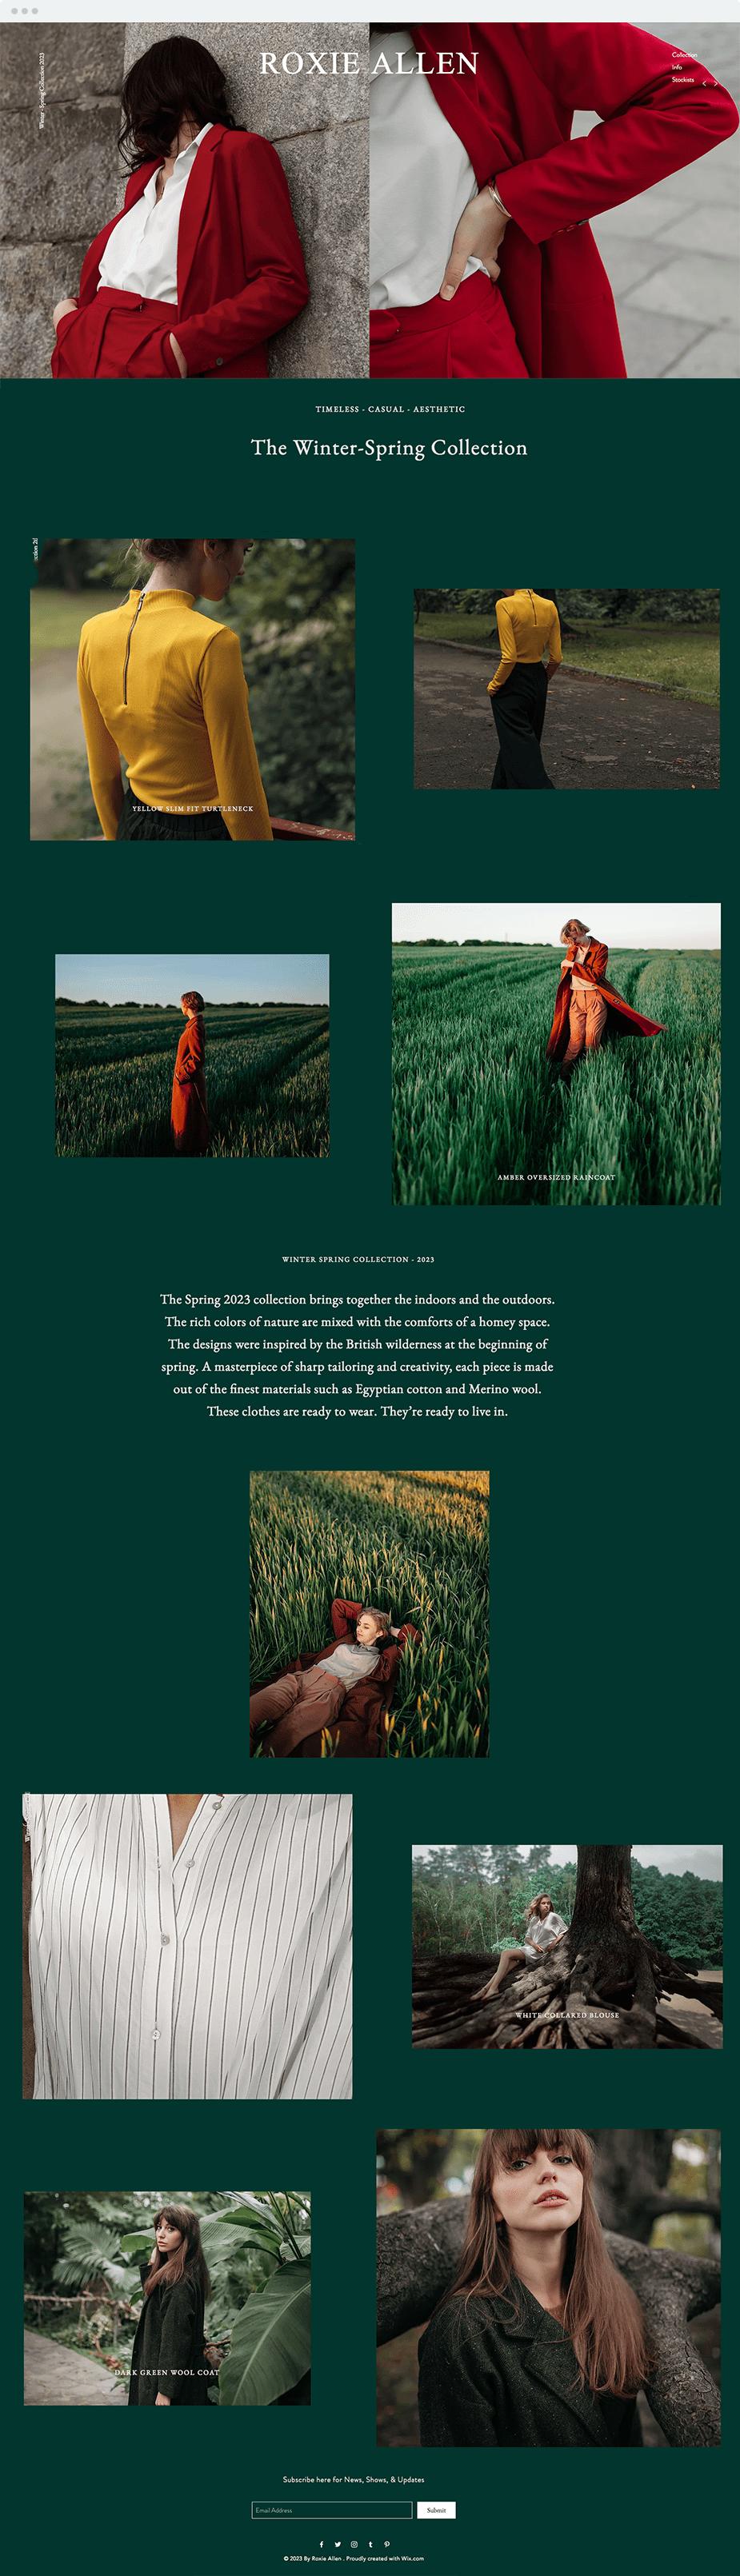 Plantilla para diseñadores de moda